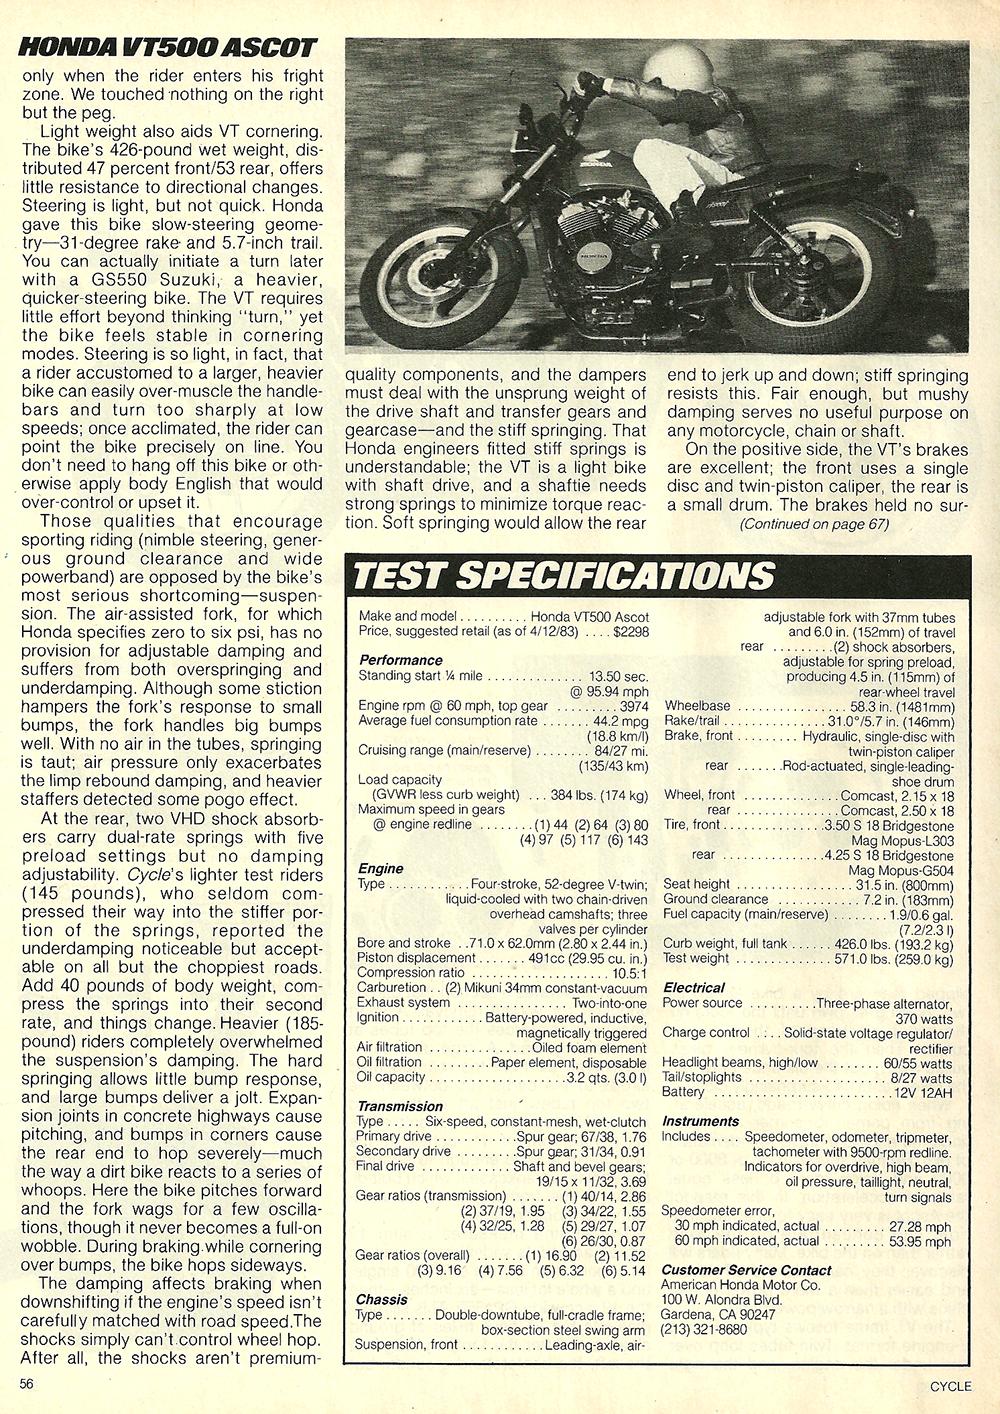 1983 Honda VT500 Ascot road test 7.jpg